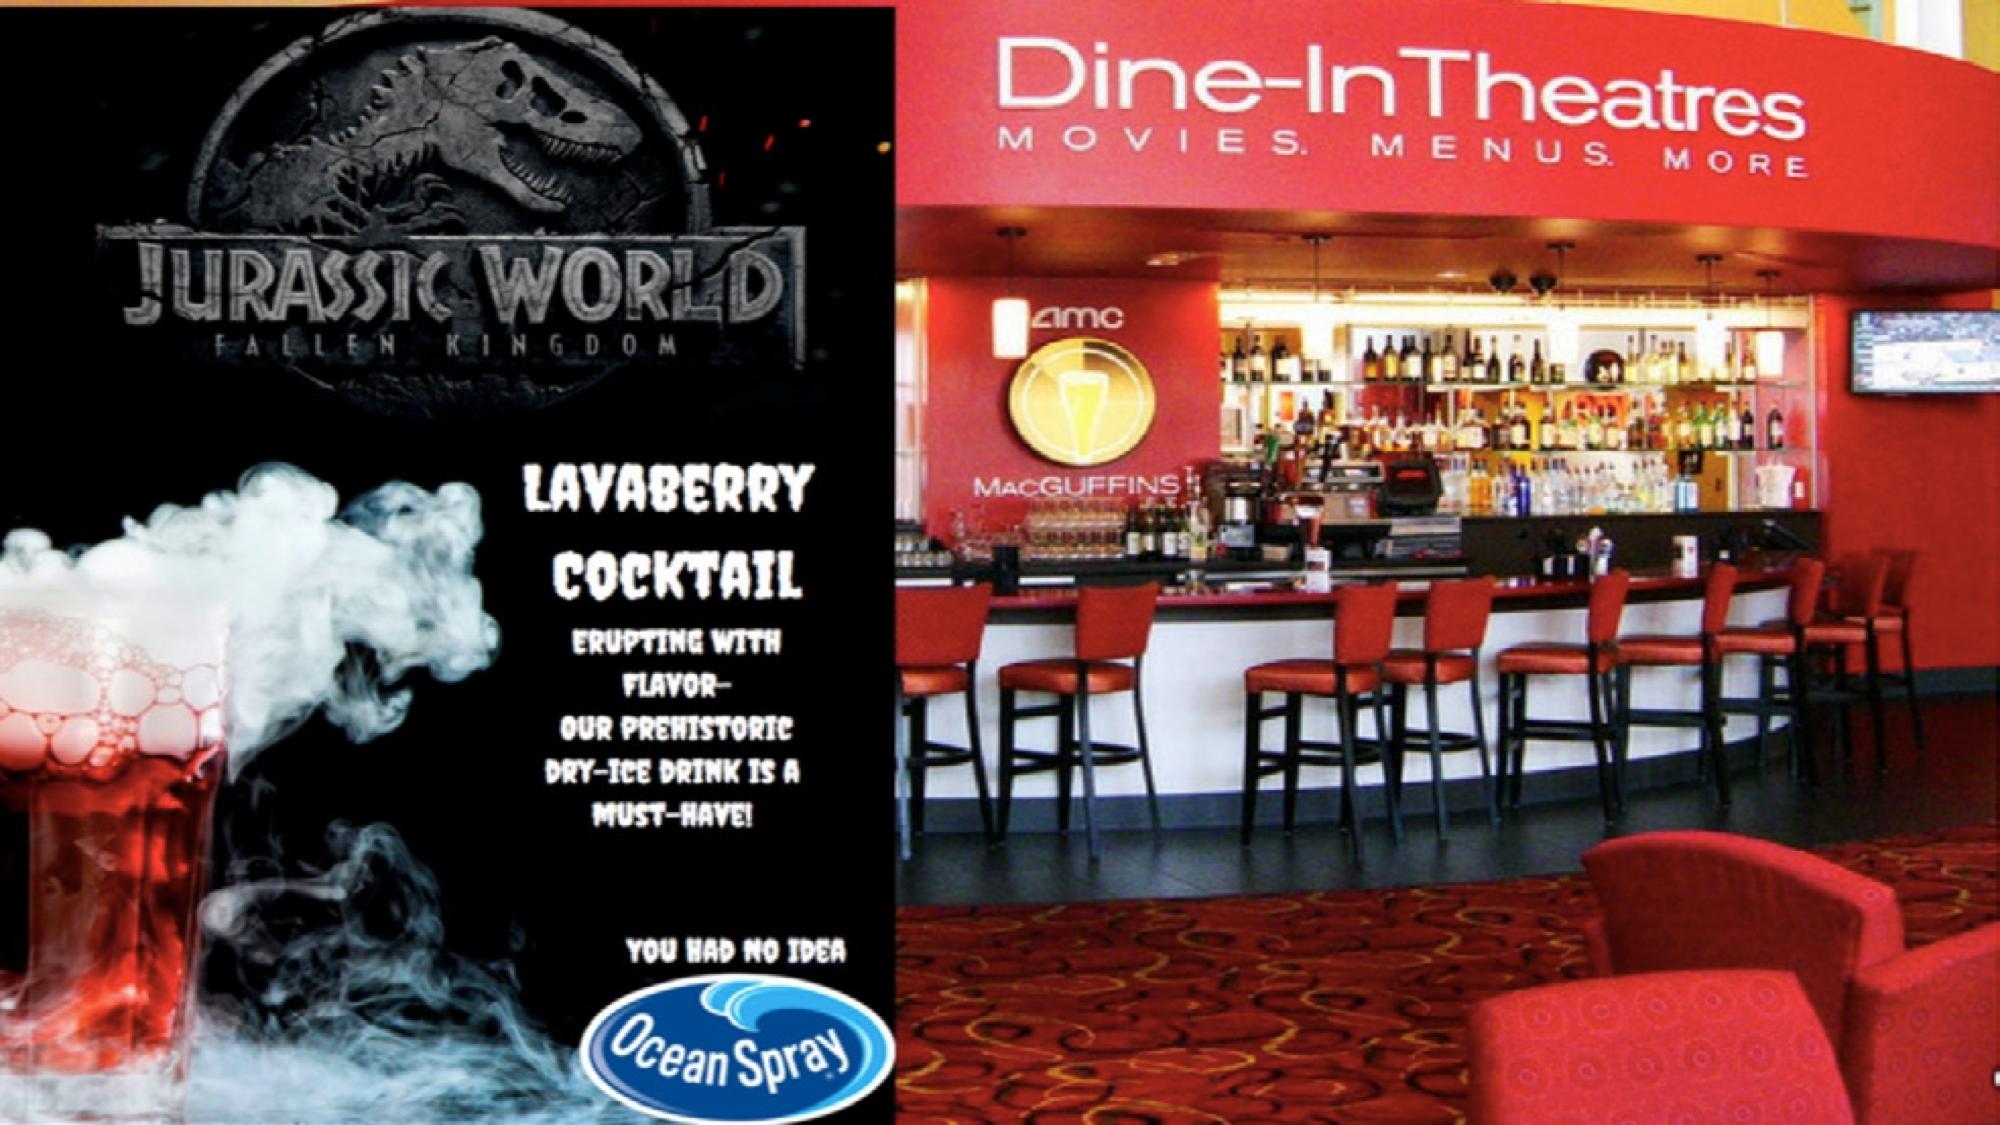 Ocean Spray's AMC cinema ads partner  with the predicted summer blockbuster, Jurassic Park: Fallen Kingdom.